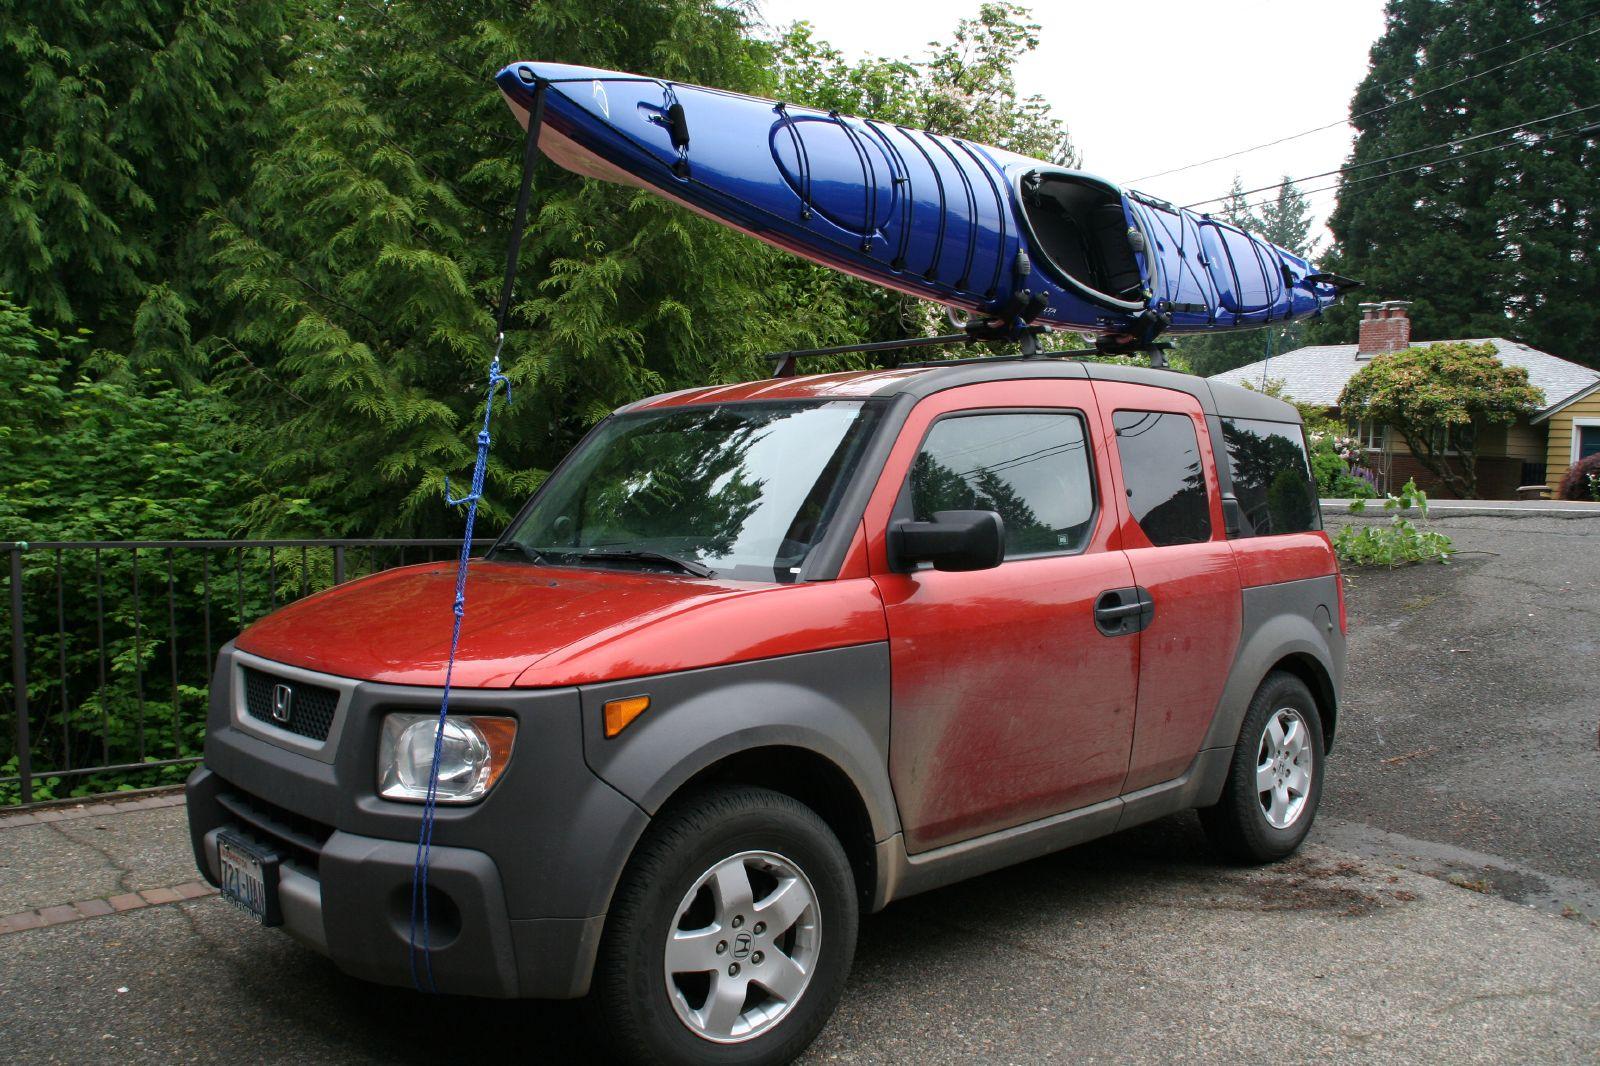 Best Kayak Roof Rack Safely Transporting Your Kayak